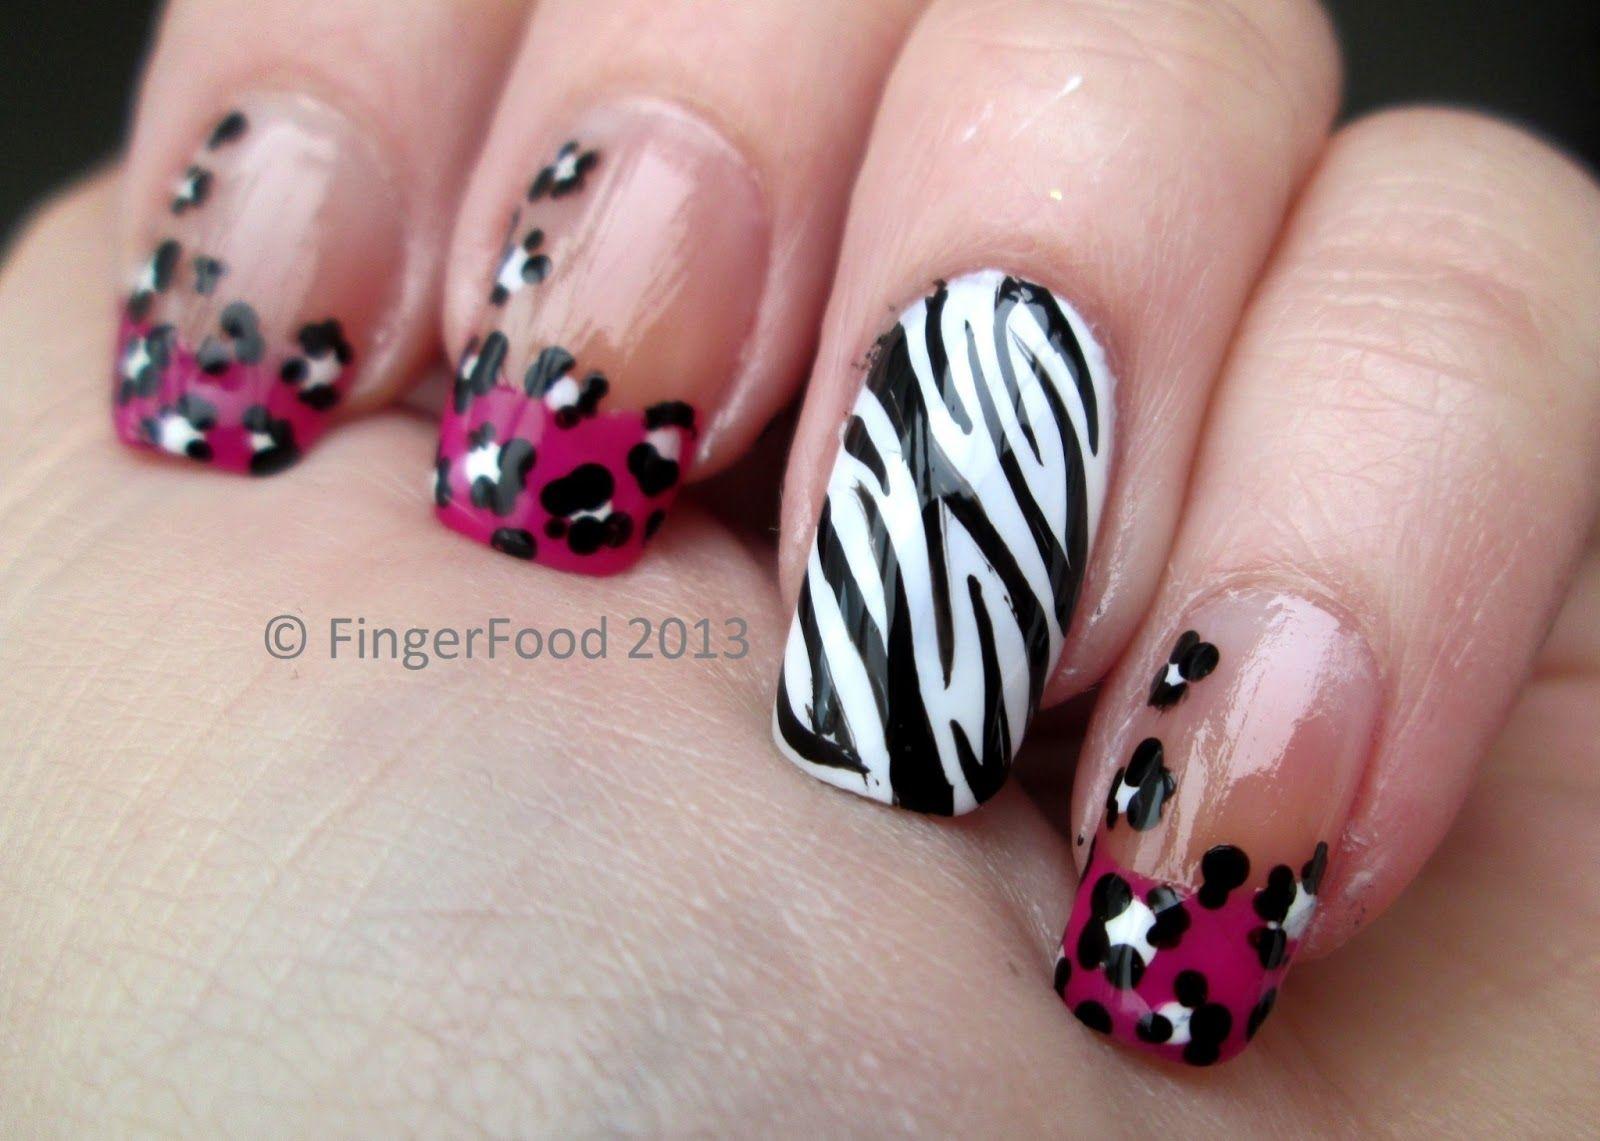 animal print french nail art designs 2013   ... you! And if you like ...